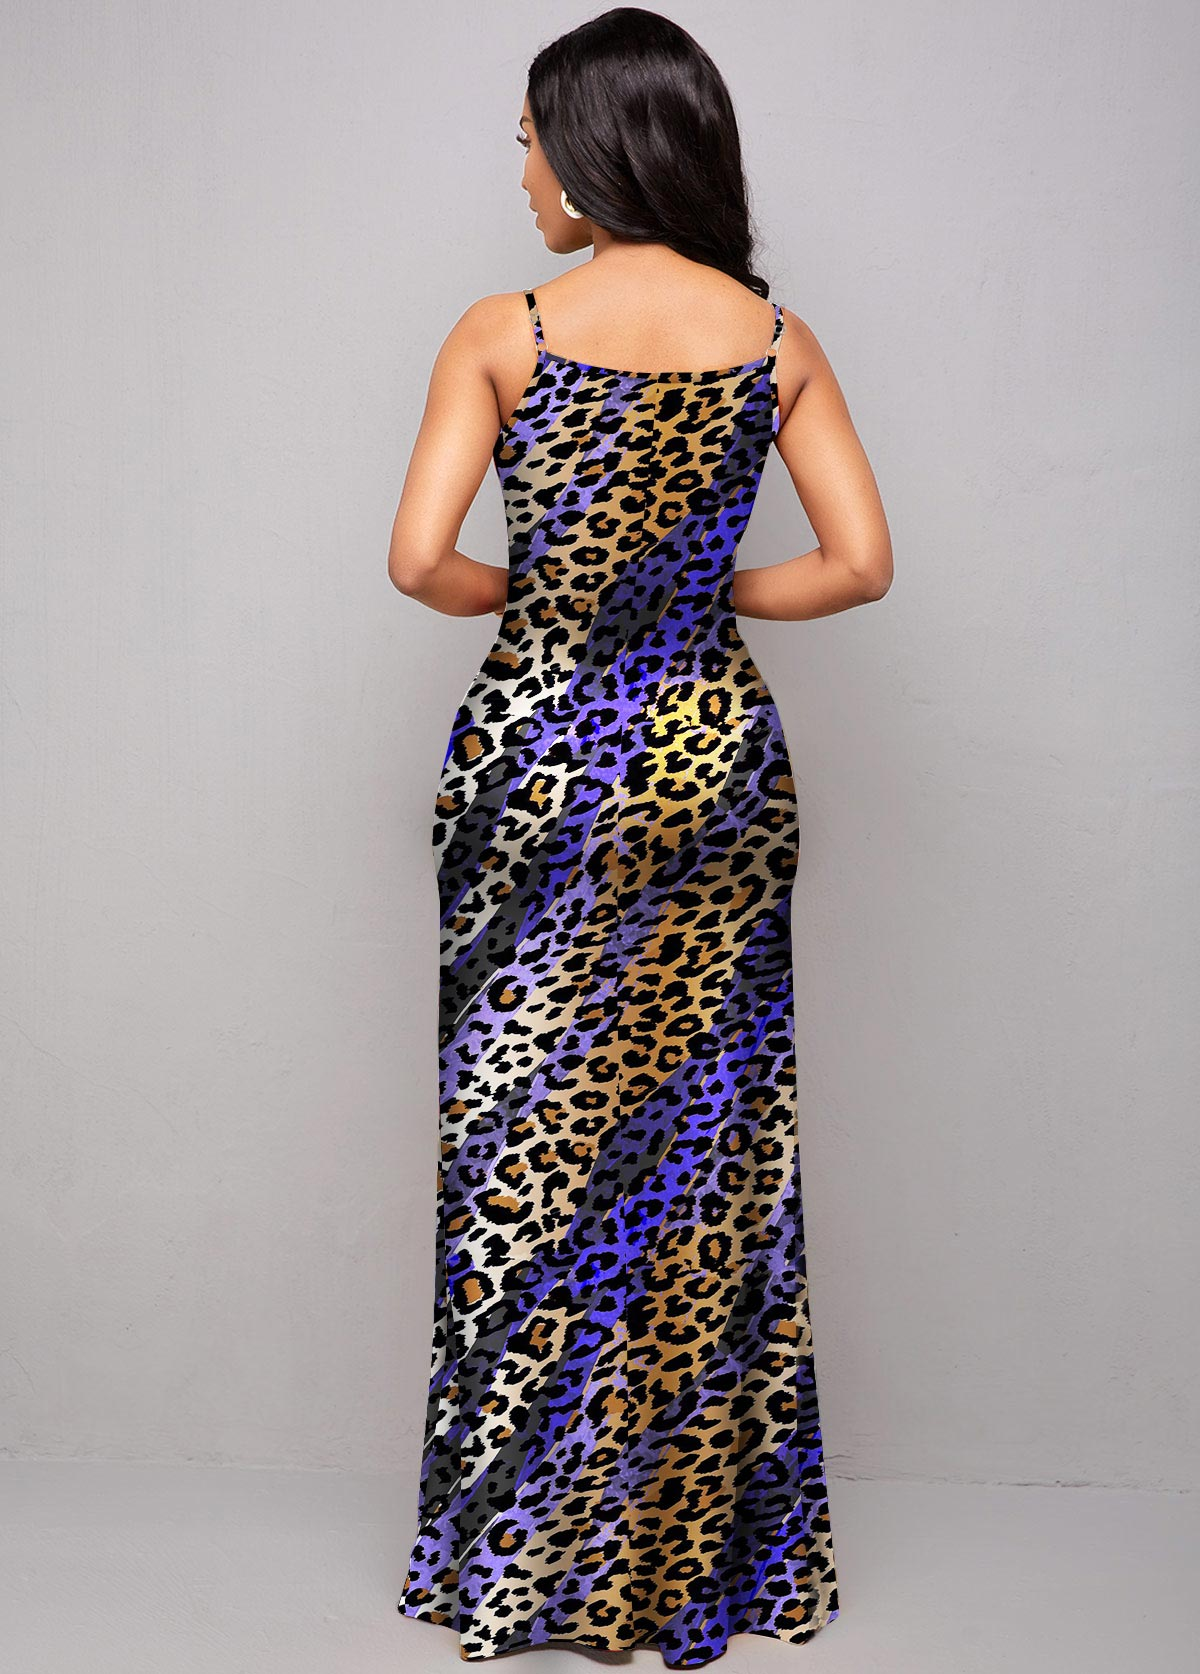 Animal Prints Spaghetti Strap Ombre Dress